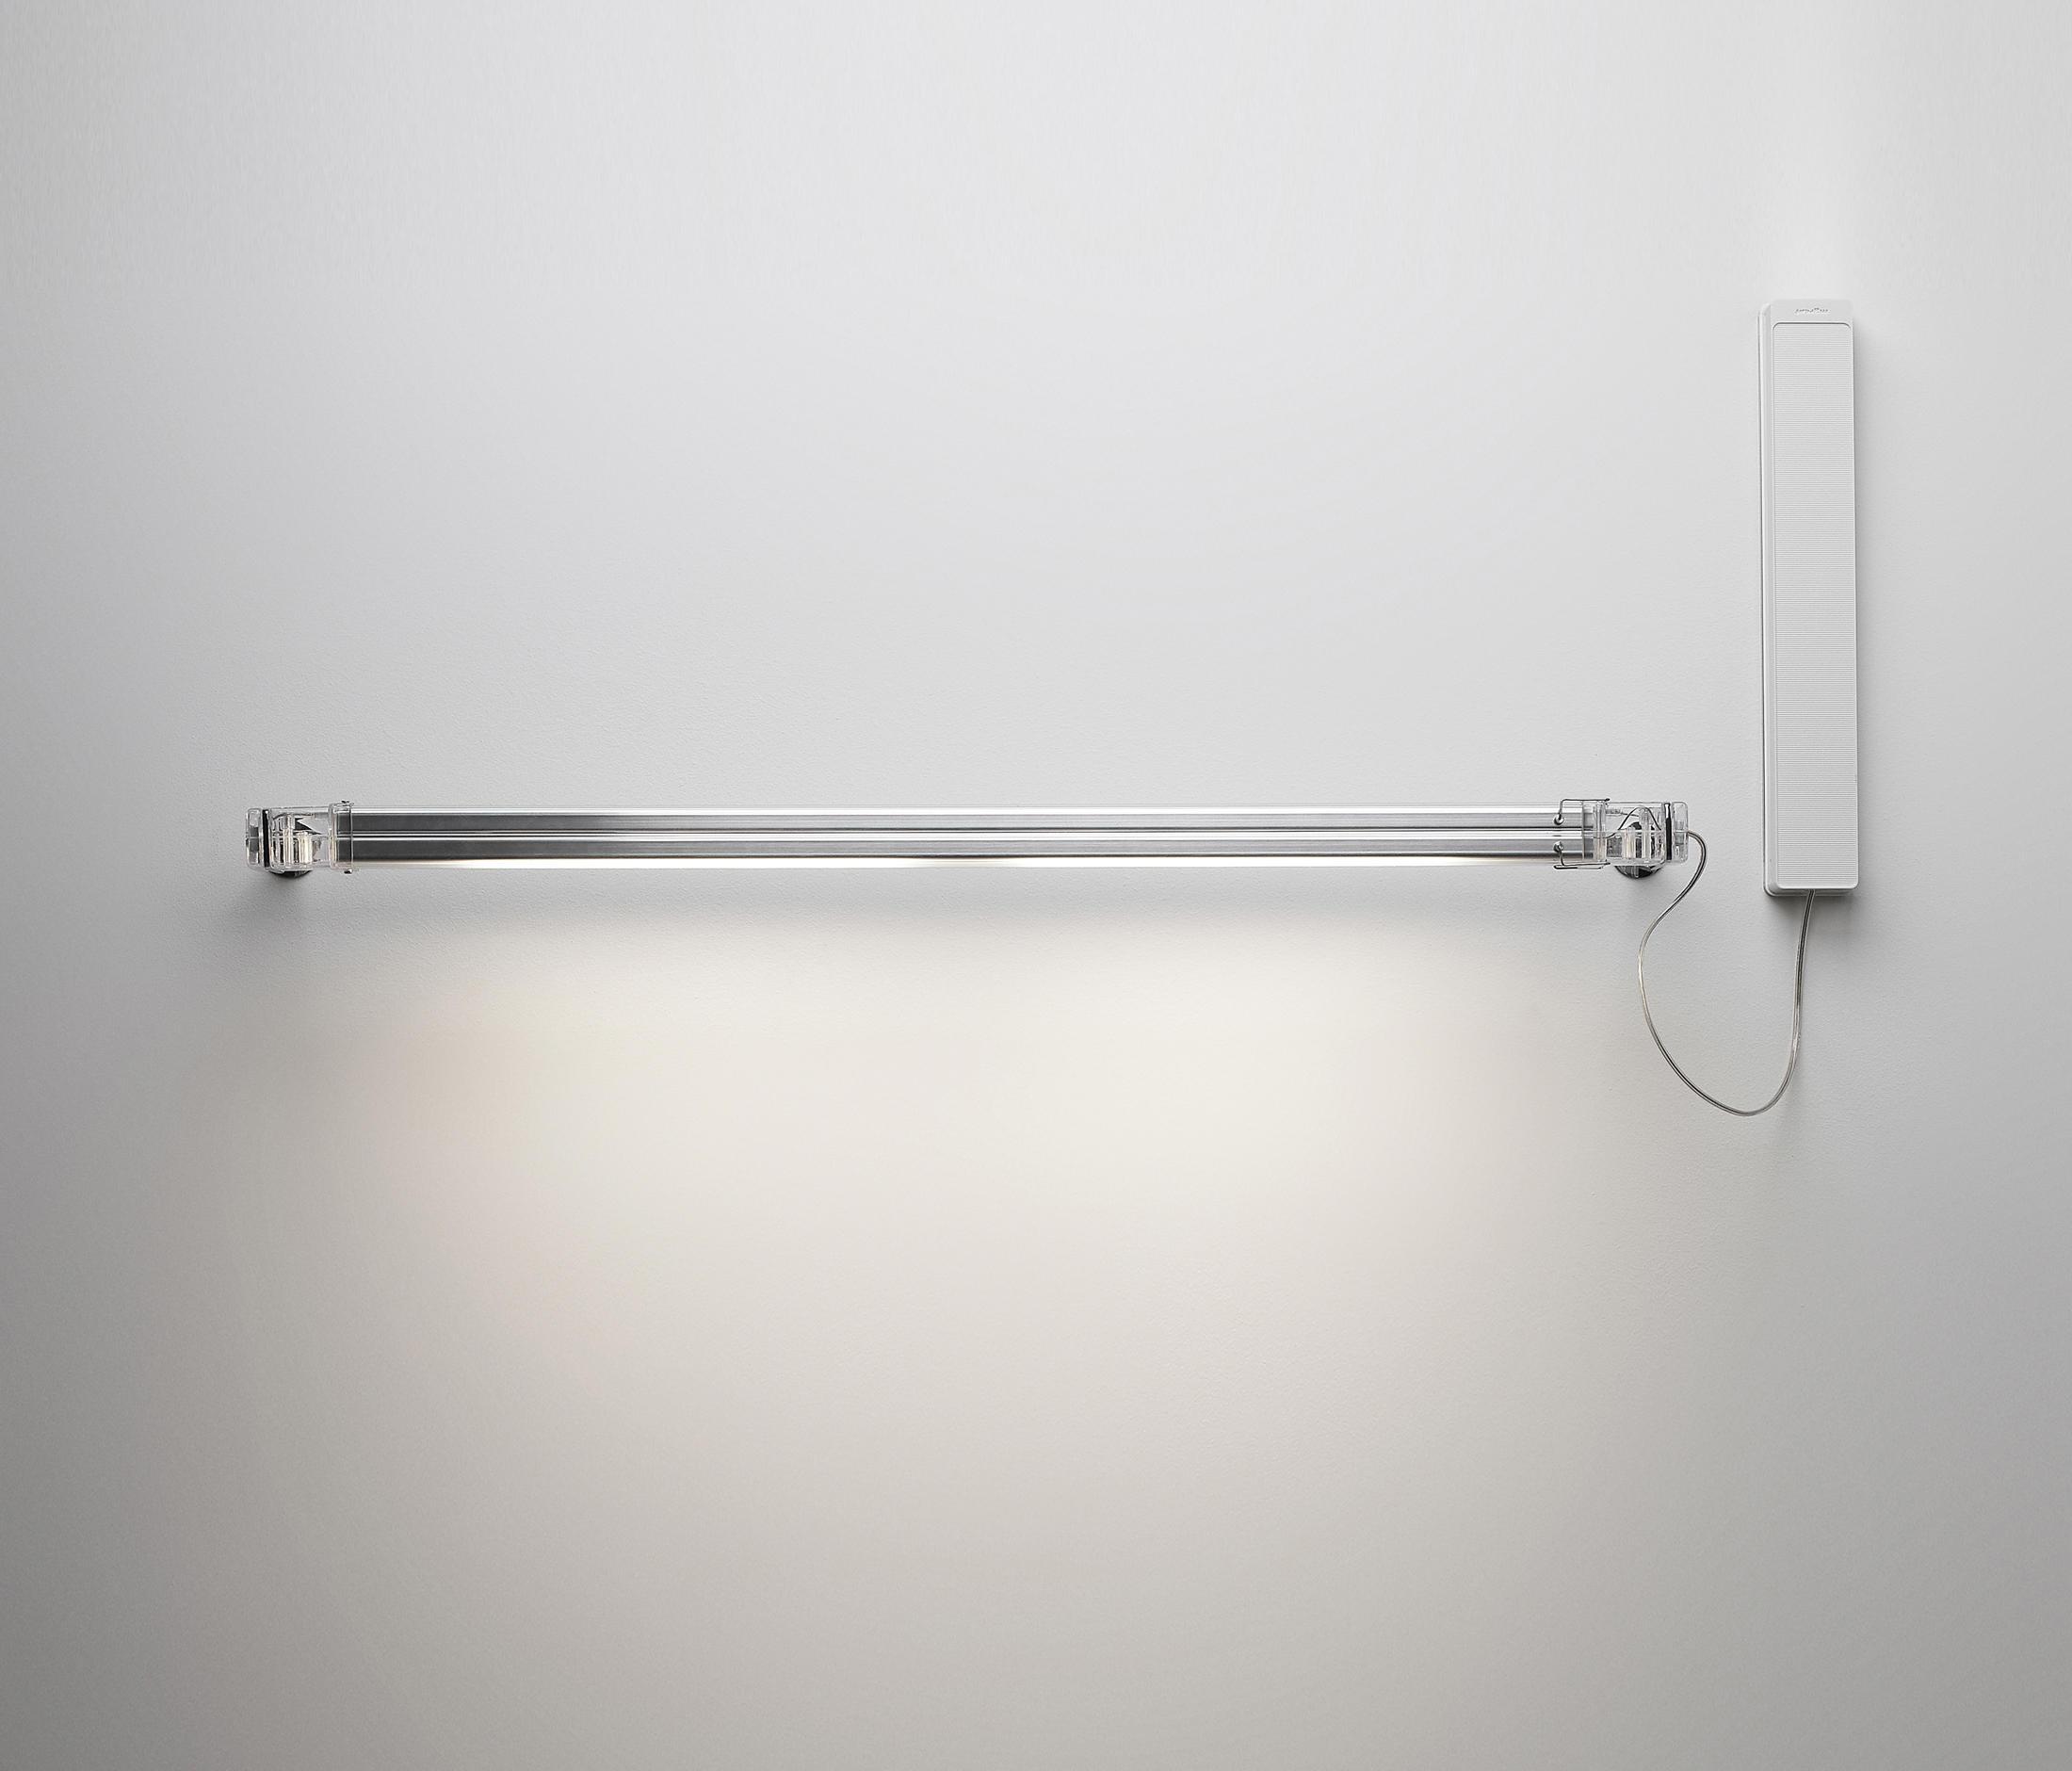 Lampade Al Neon Da Parete neón de luz nl-a alu led   architonic